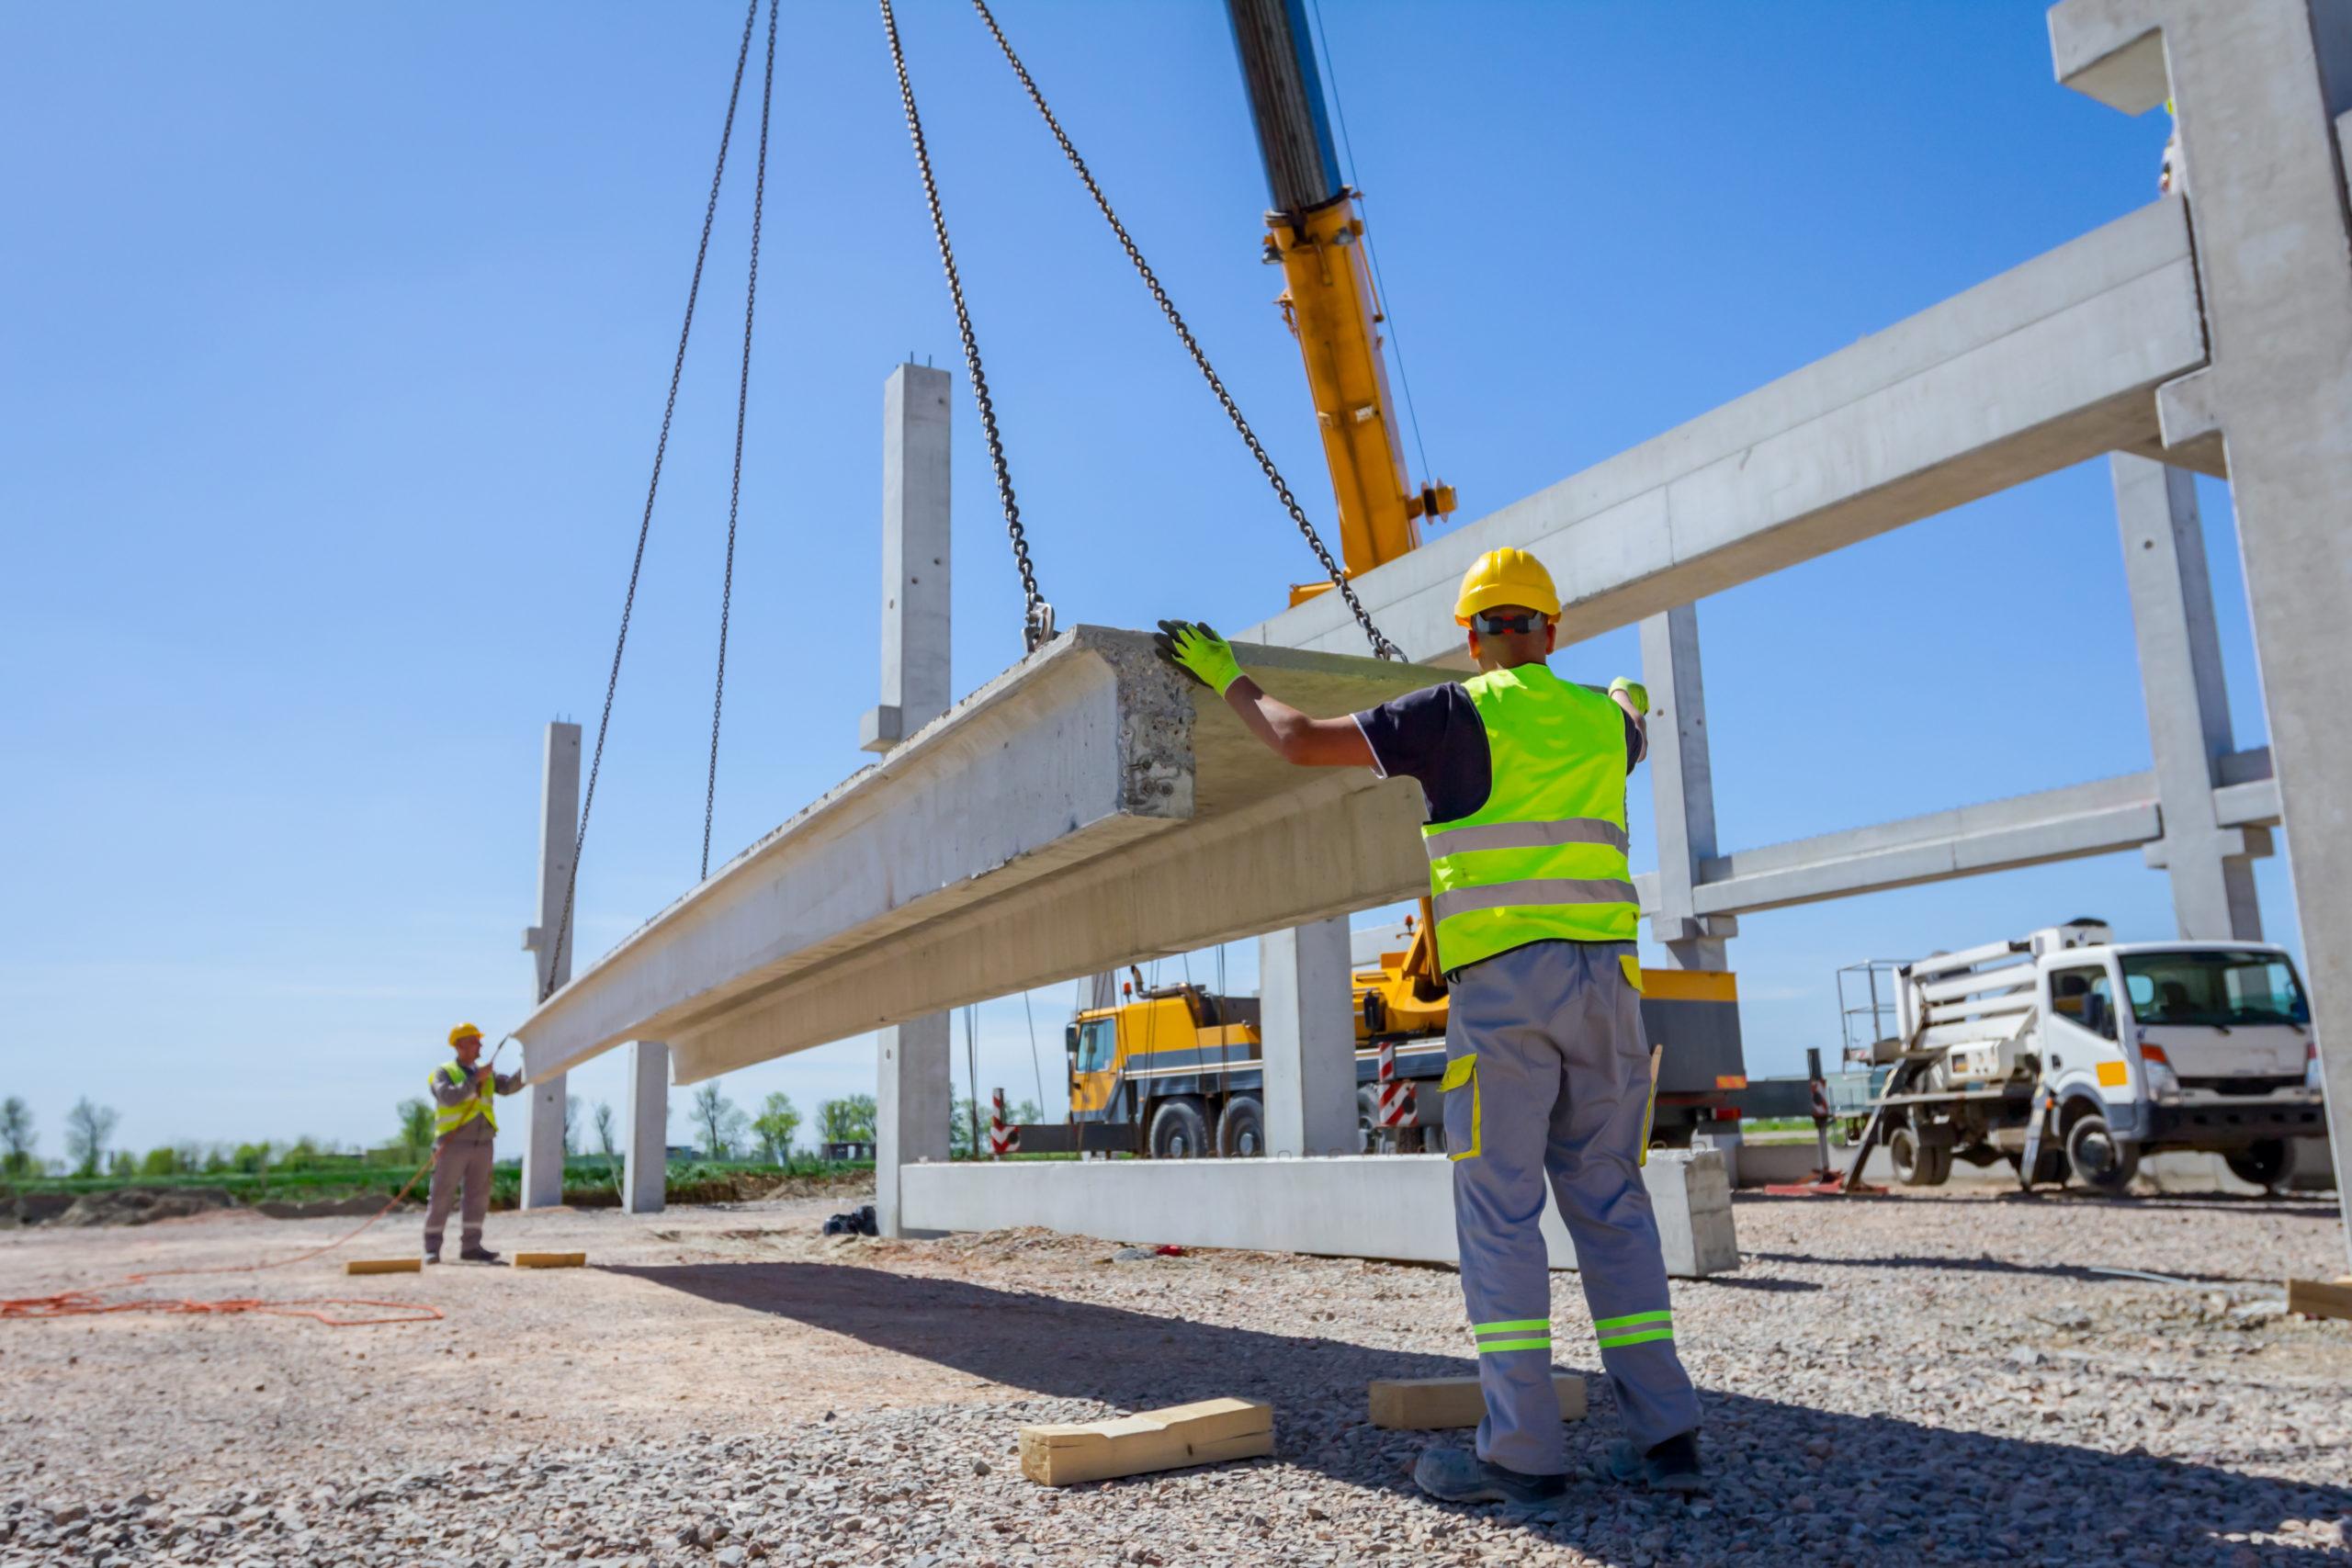 Crane rigging services in Minnesota